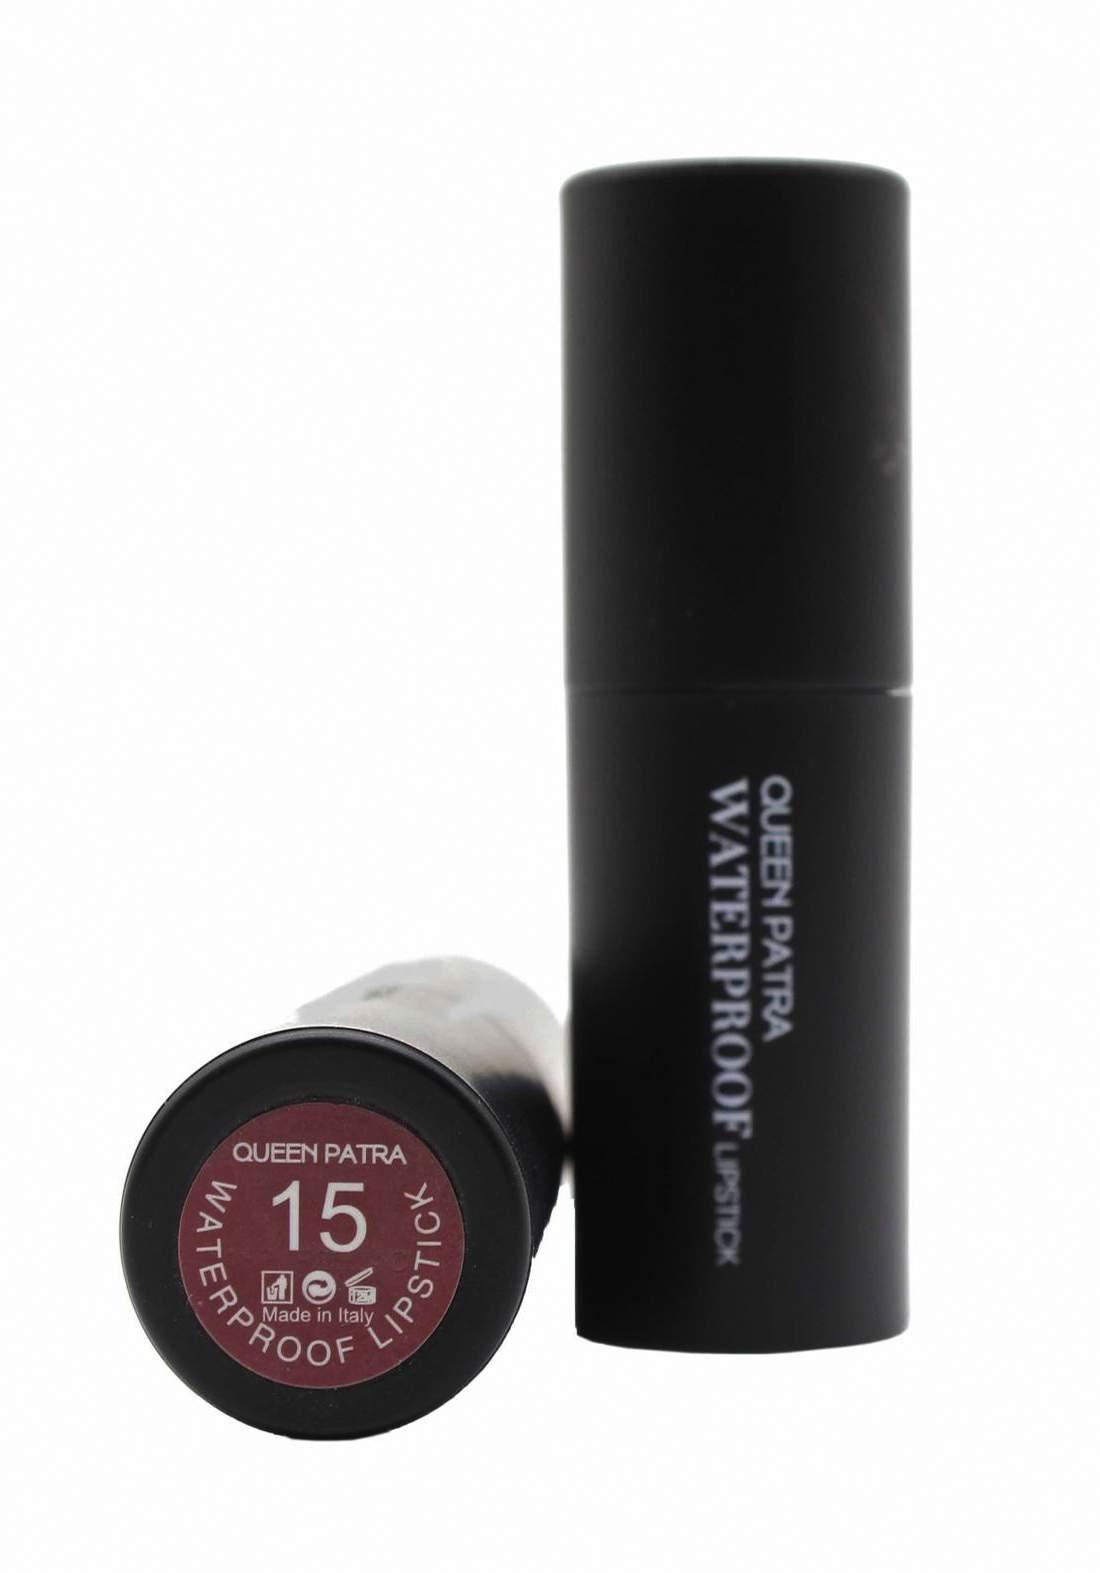 Queen Batra Waterproof Lipstick No.015 احمر شفاه